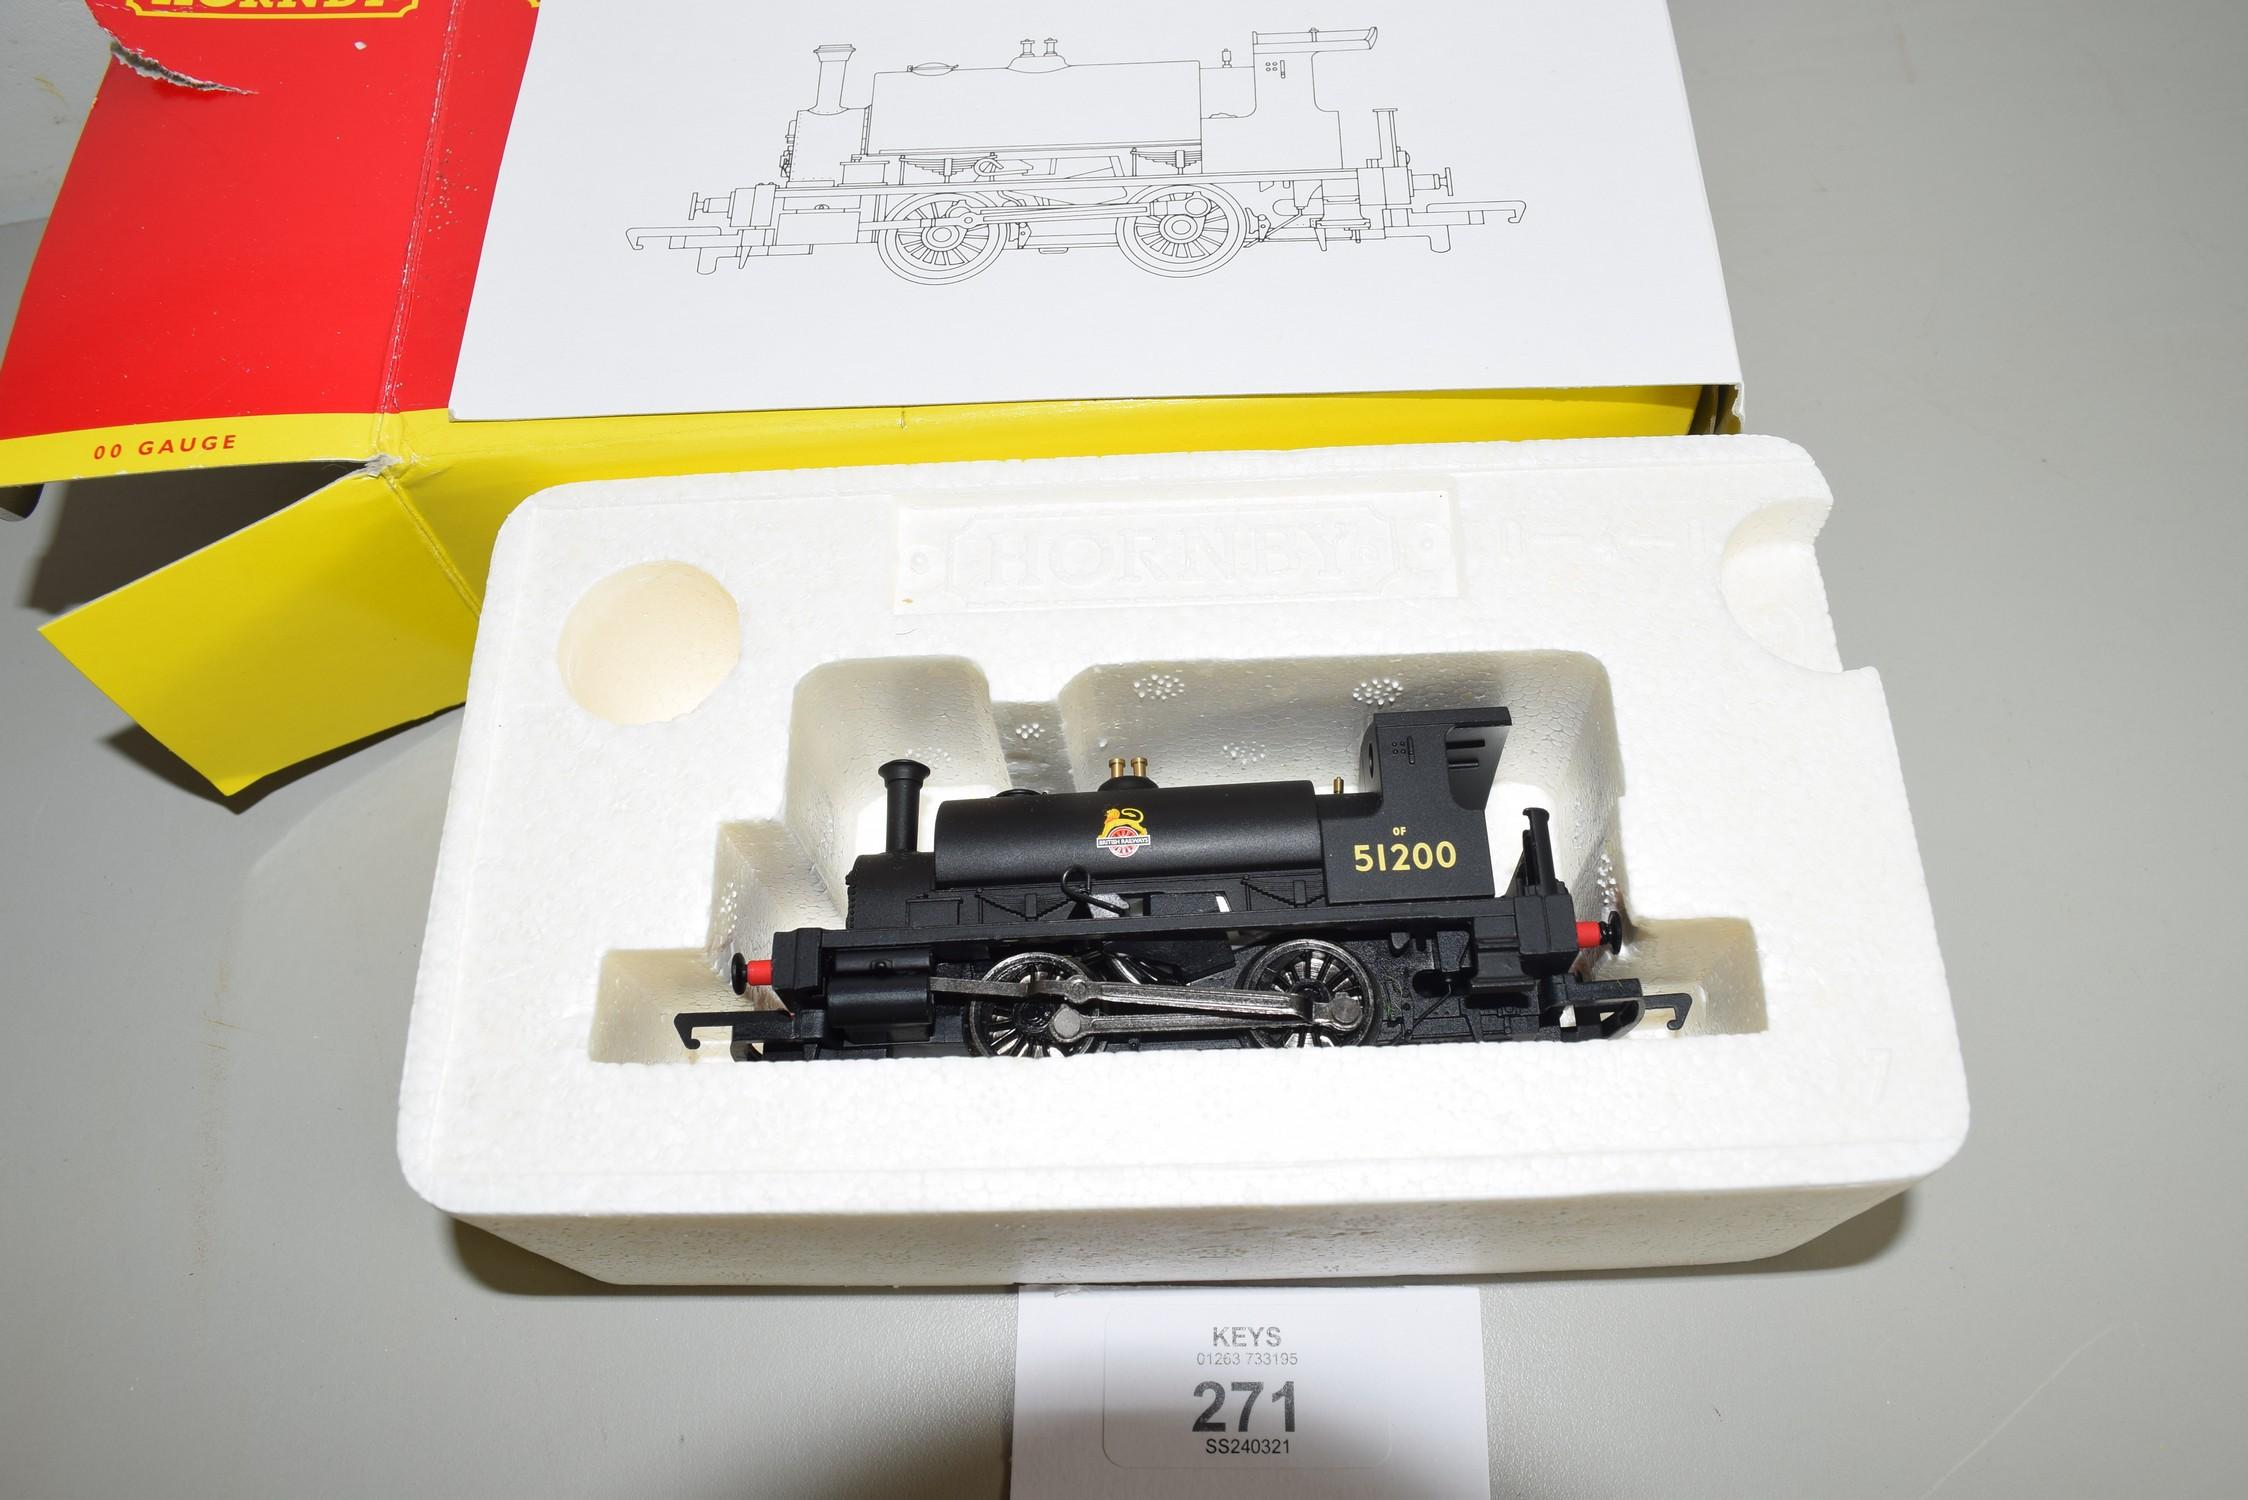 Boxed Hornby 00 gauge R2960 BR 0-4-0 Hornby Collector Club locomotive 2010 No 51200